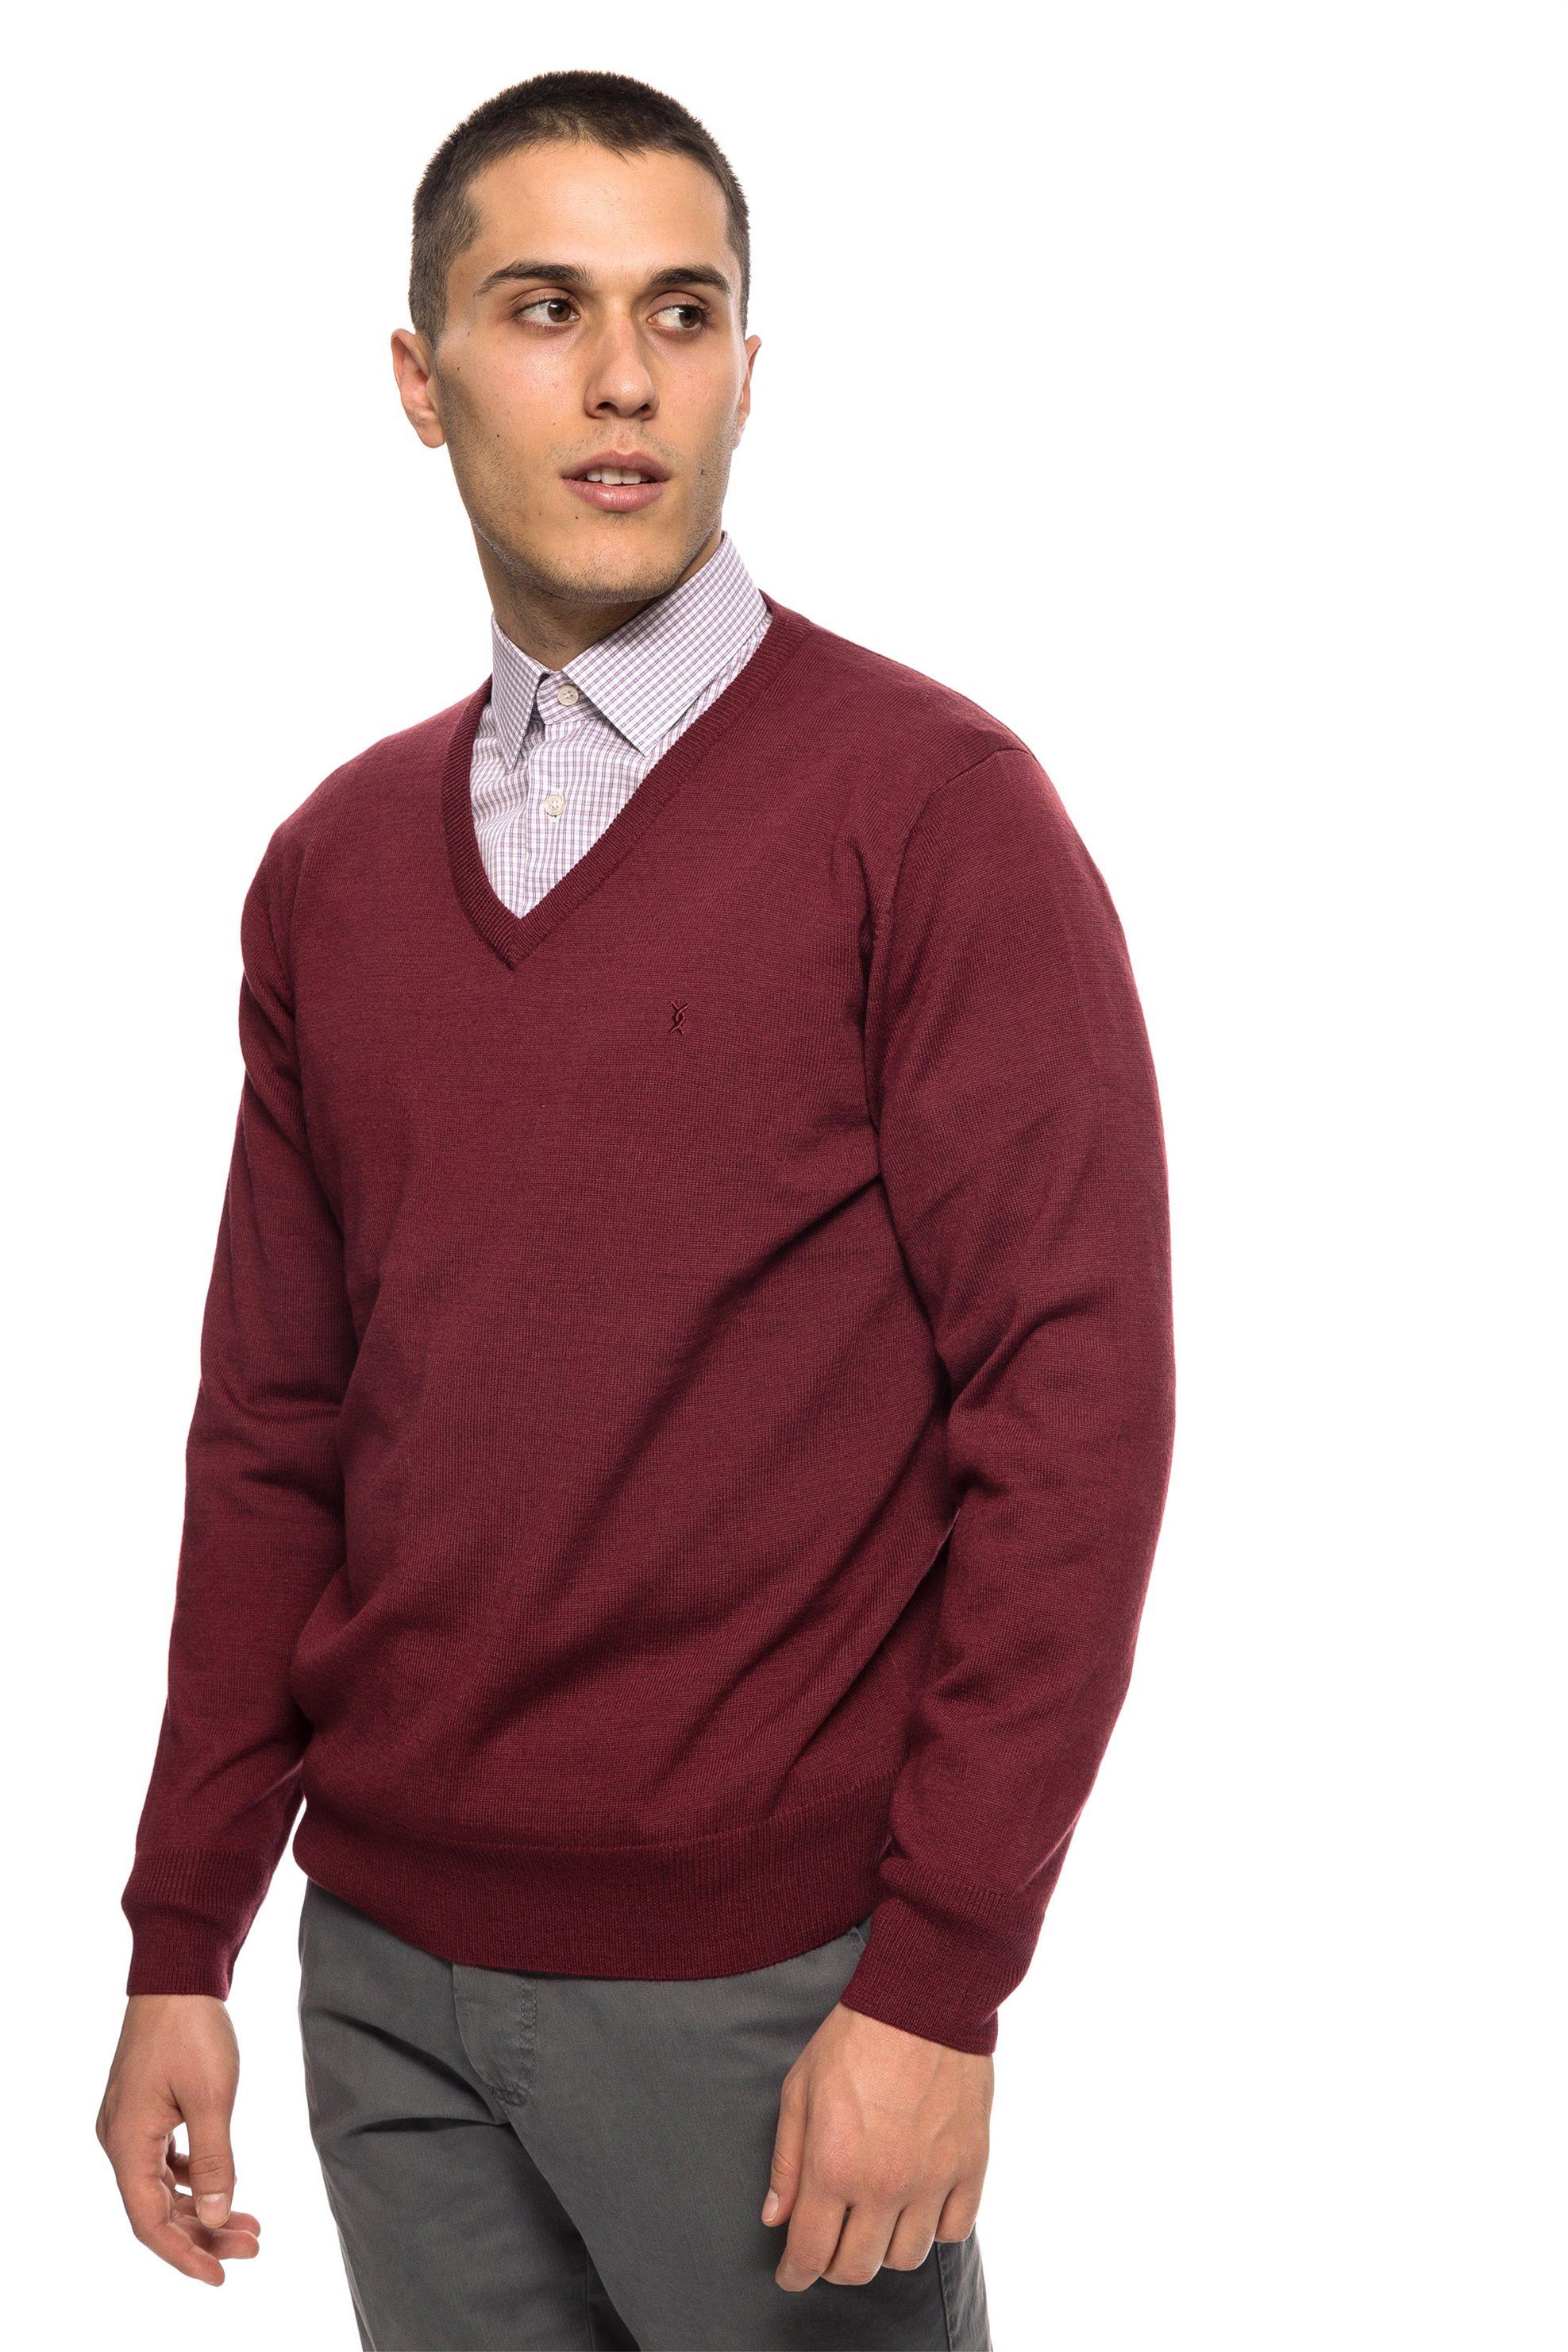 The Bostonians ανδρική πλεκτή μπλούζα με V λαιμόκοψη - MV1001 - Βυσσινί